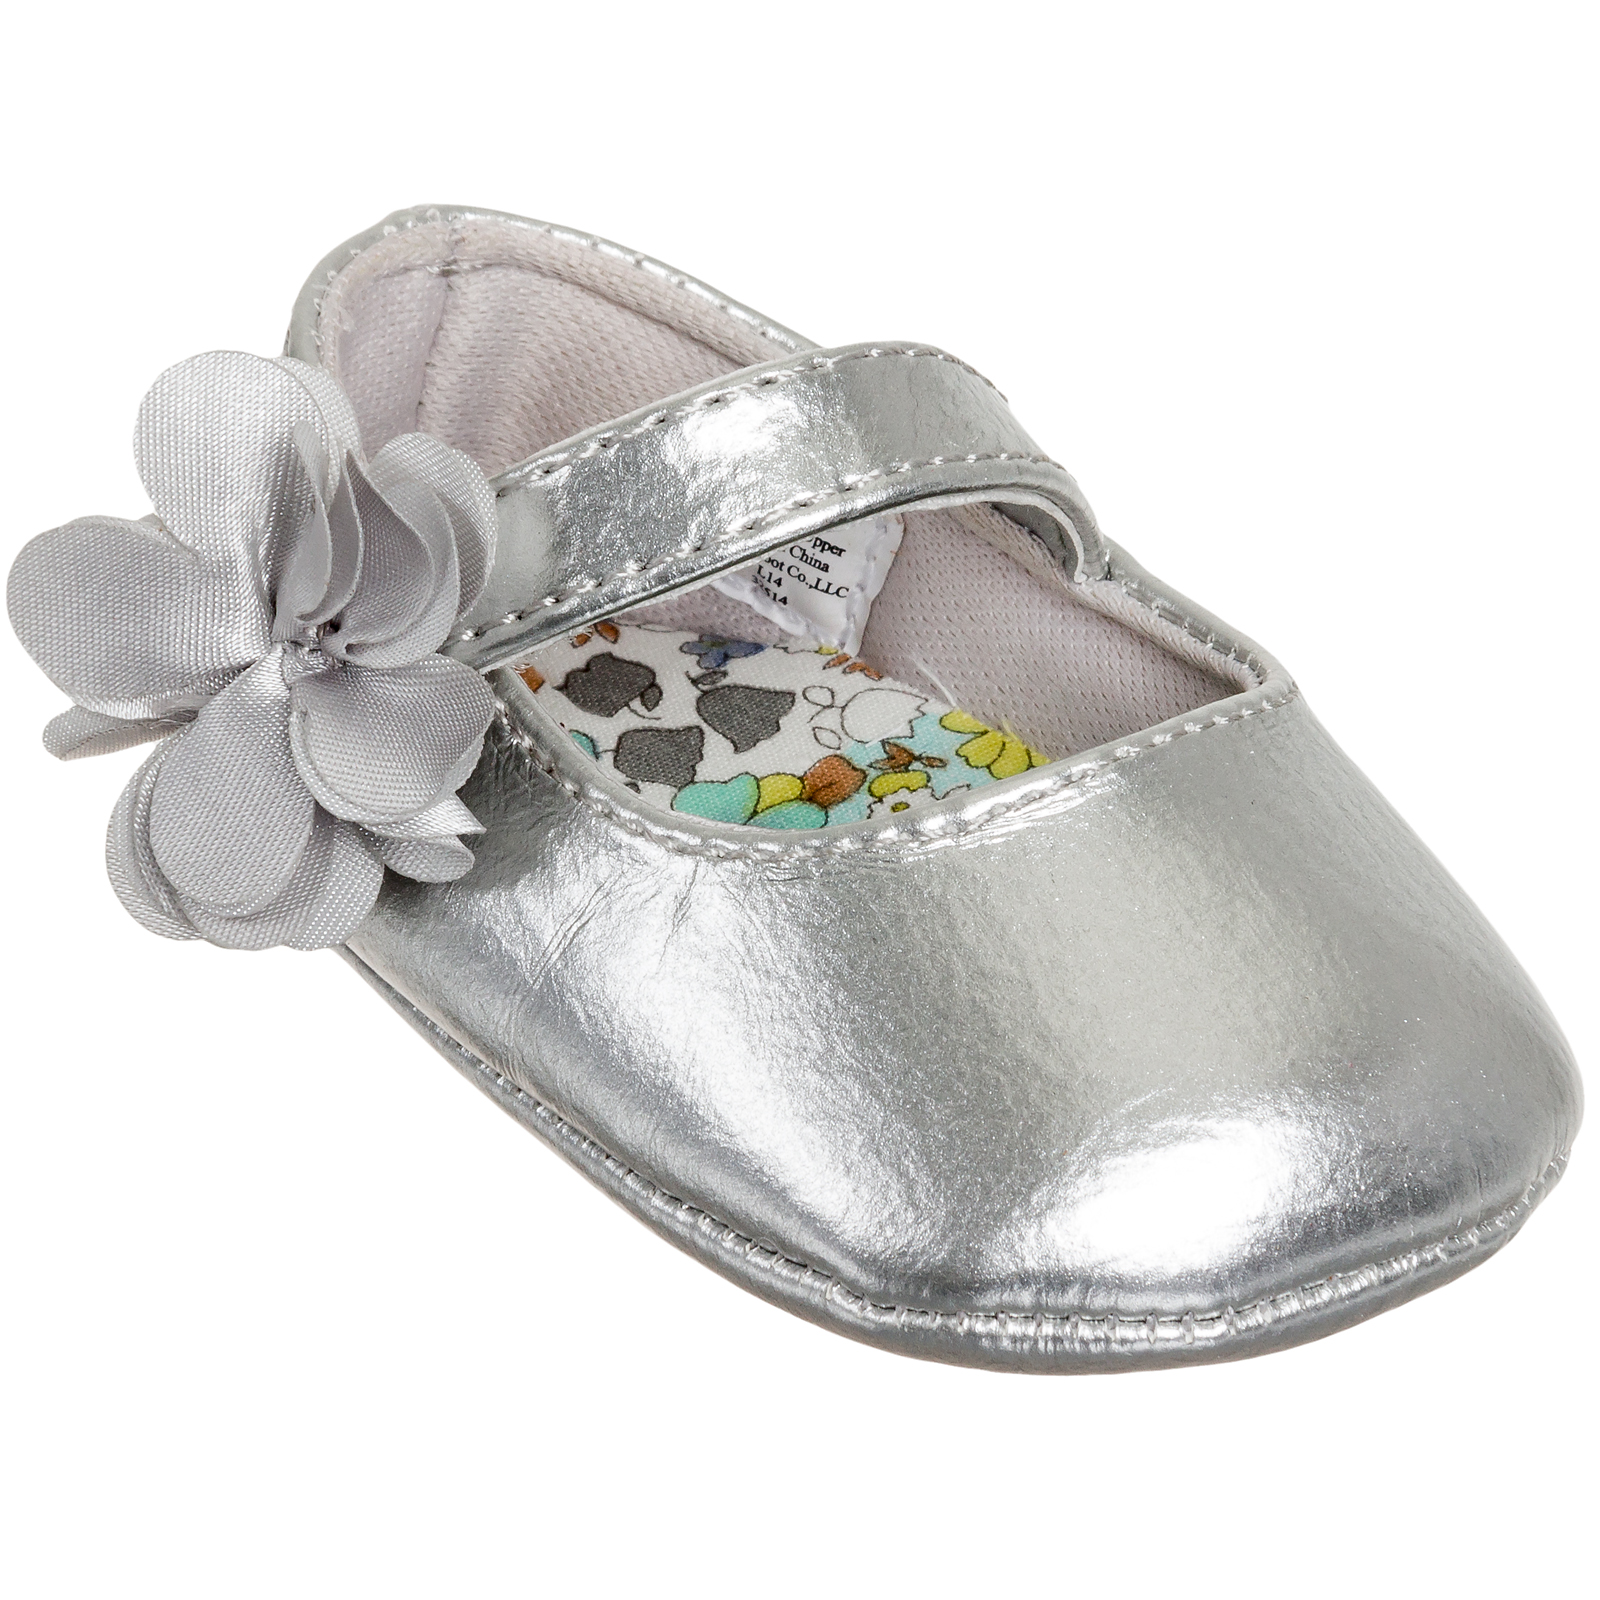 Baby Deer Girls Patent Skimmer Soft-Sole Ballet Flat Shoes (Silver, 2 US Infant)